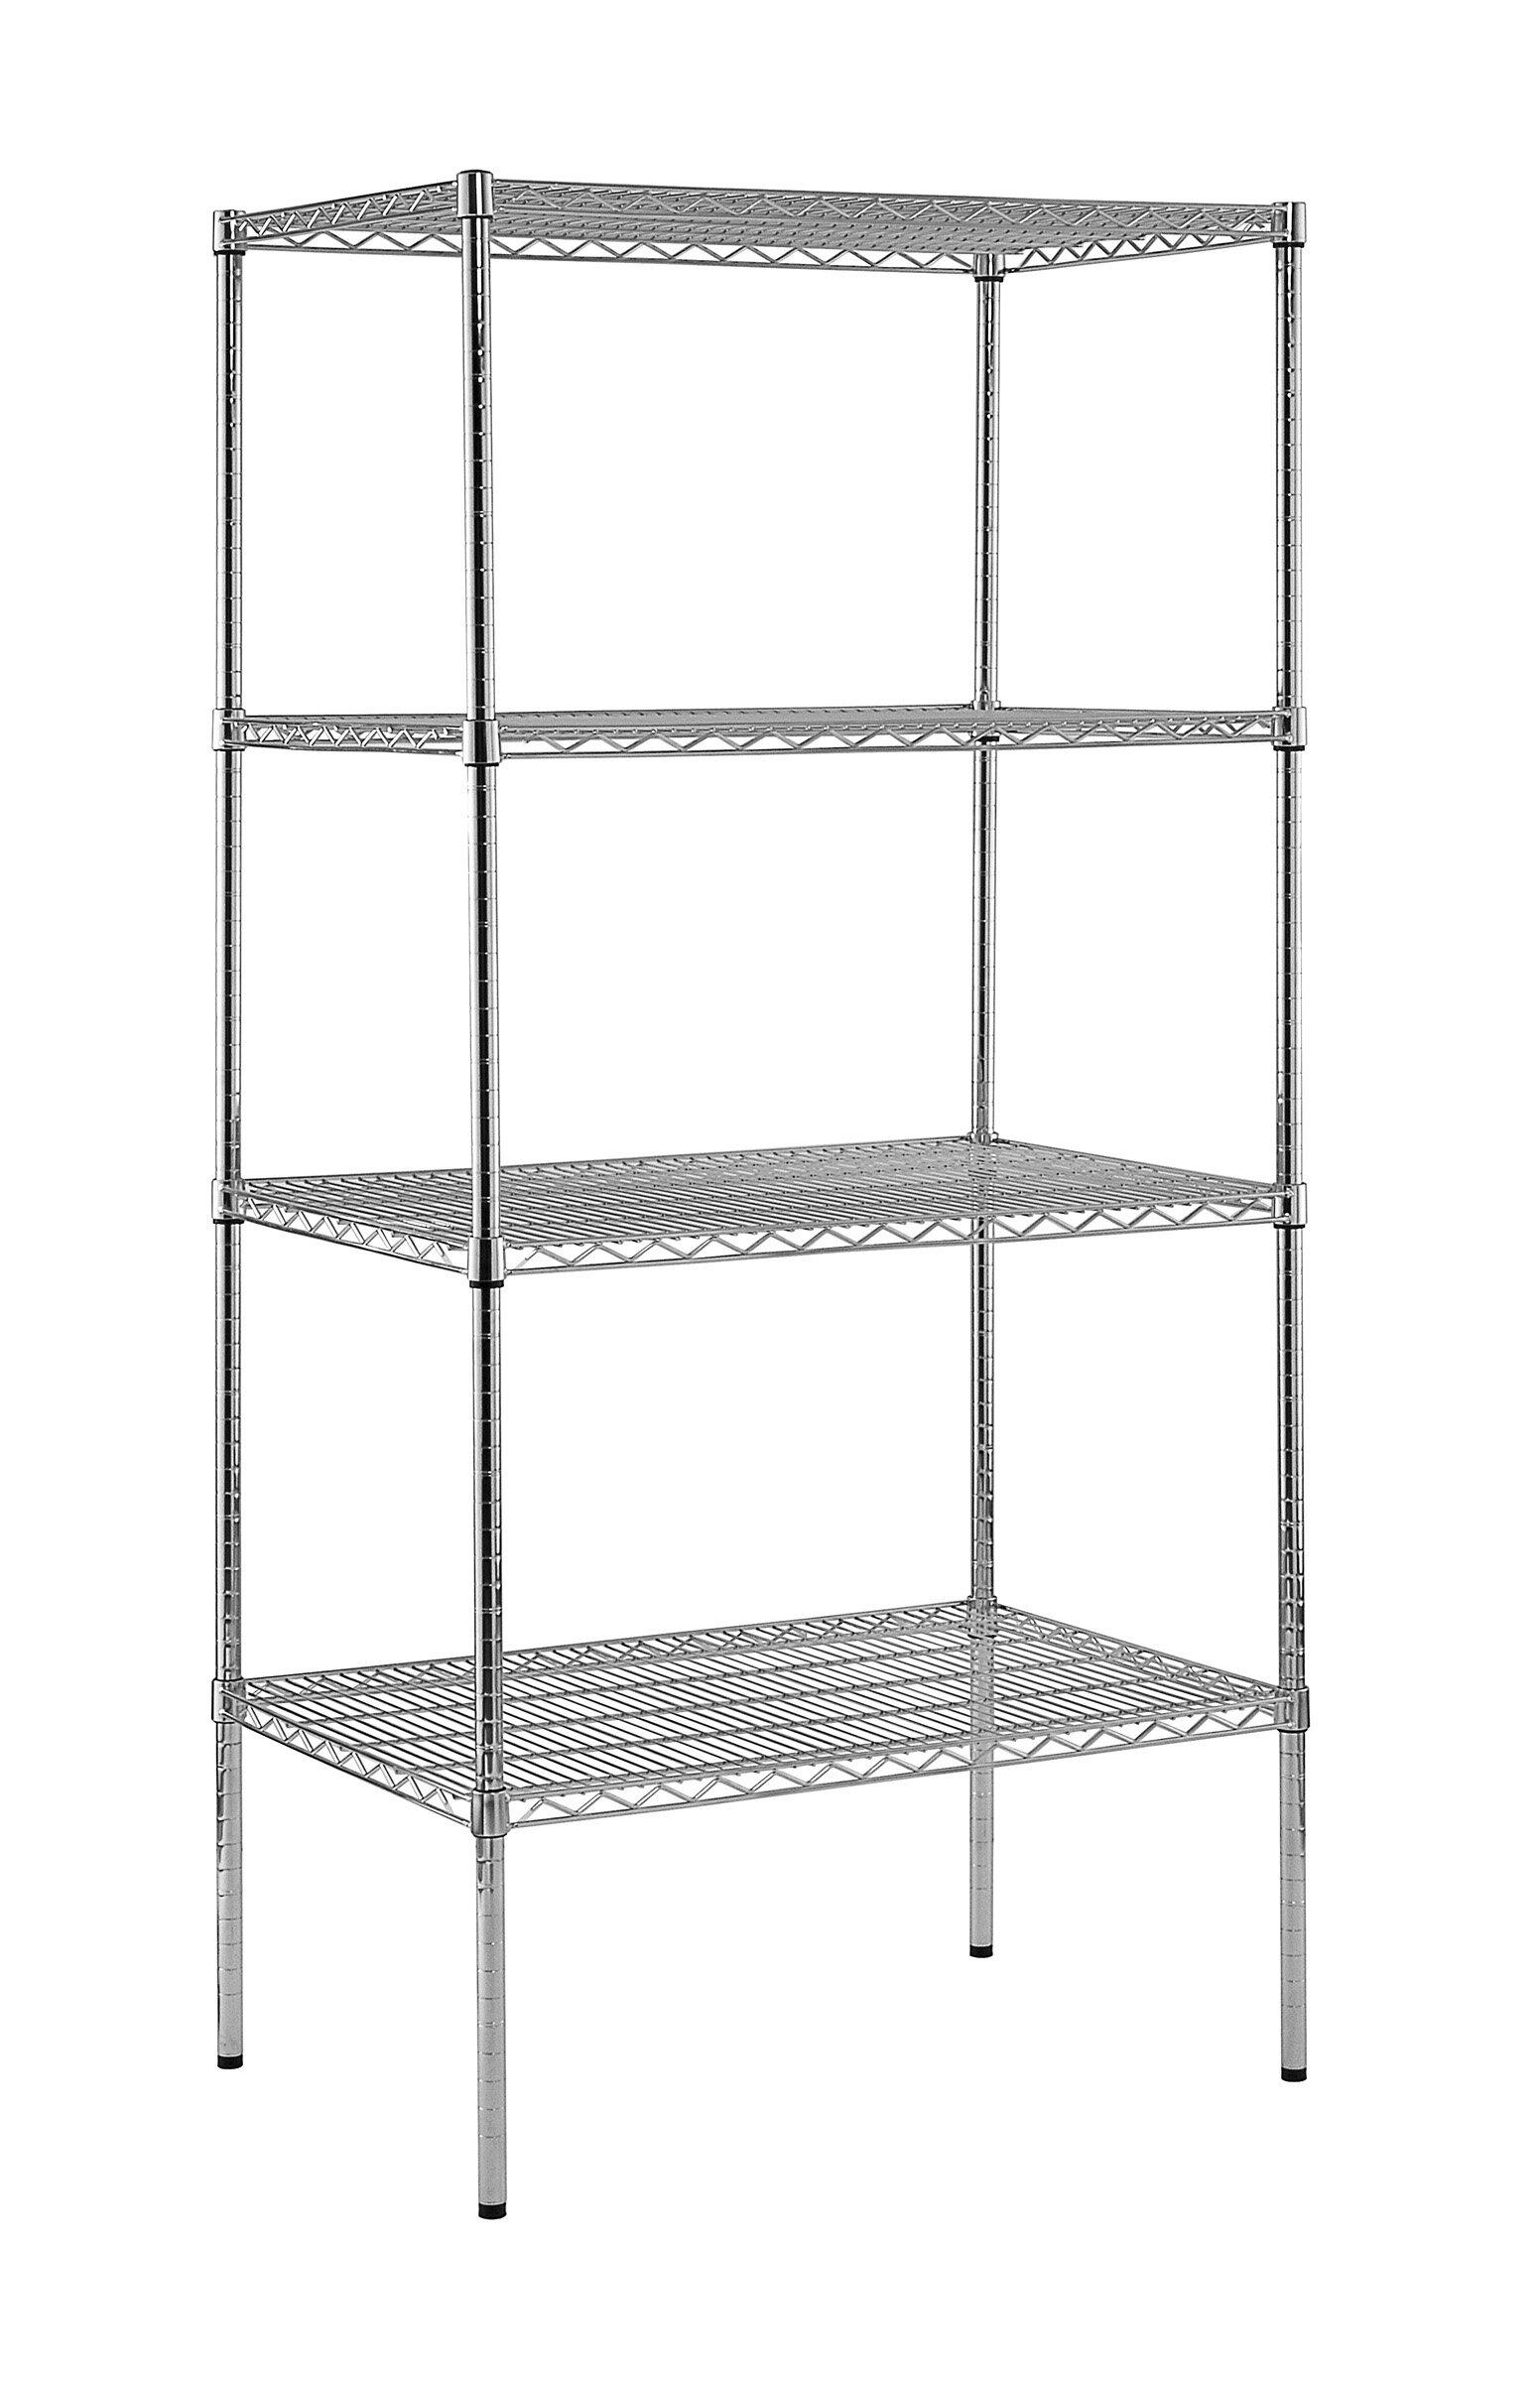 sandusky heavy duty shelf wire shelving unit reviews wayfair - Heavy Duty Bookshelves